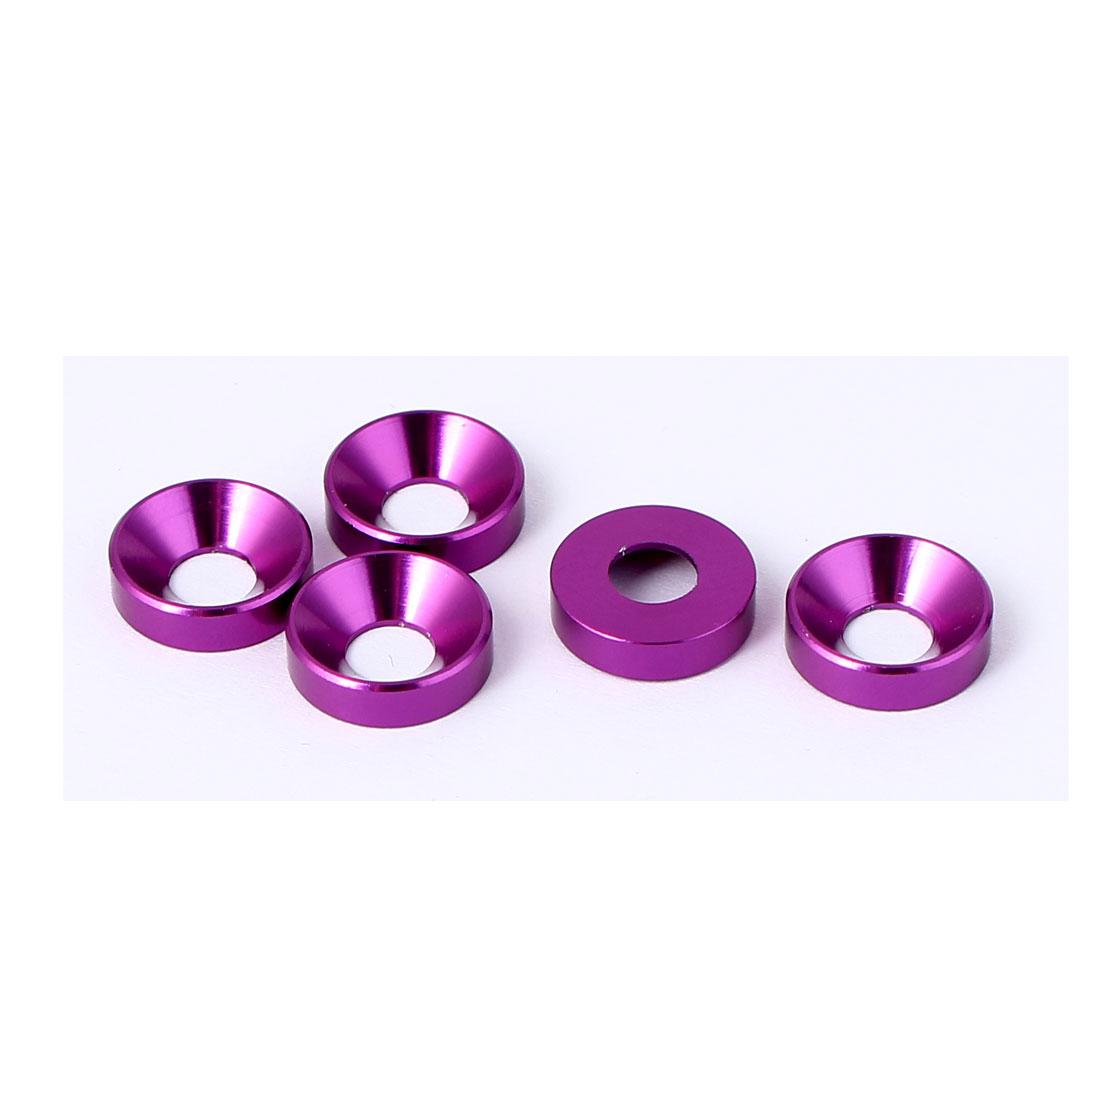 M5 Flat Head Screw Bolt Aluminum Countersunk Washers Purple 5 Pcs